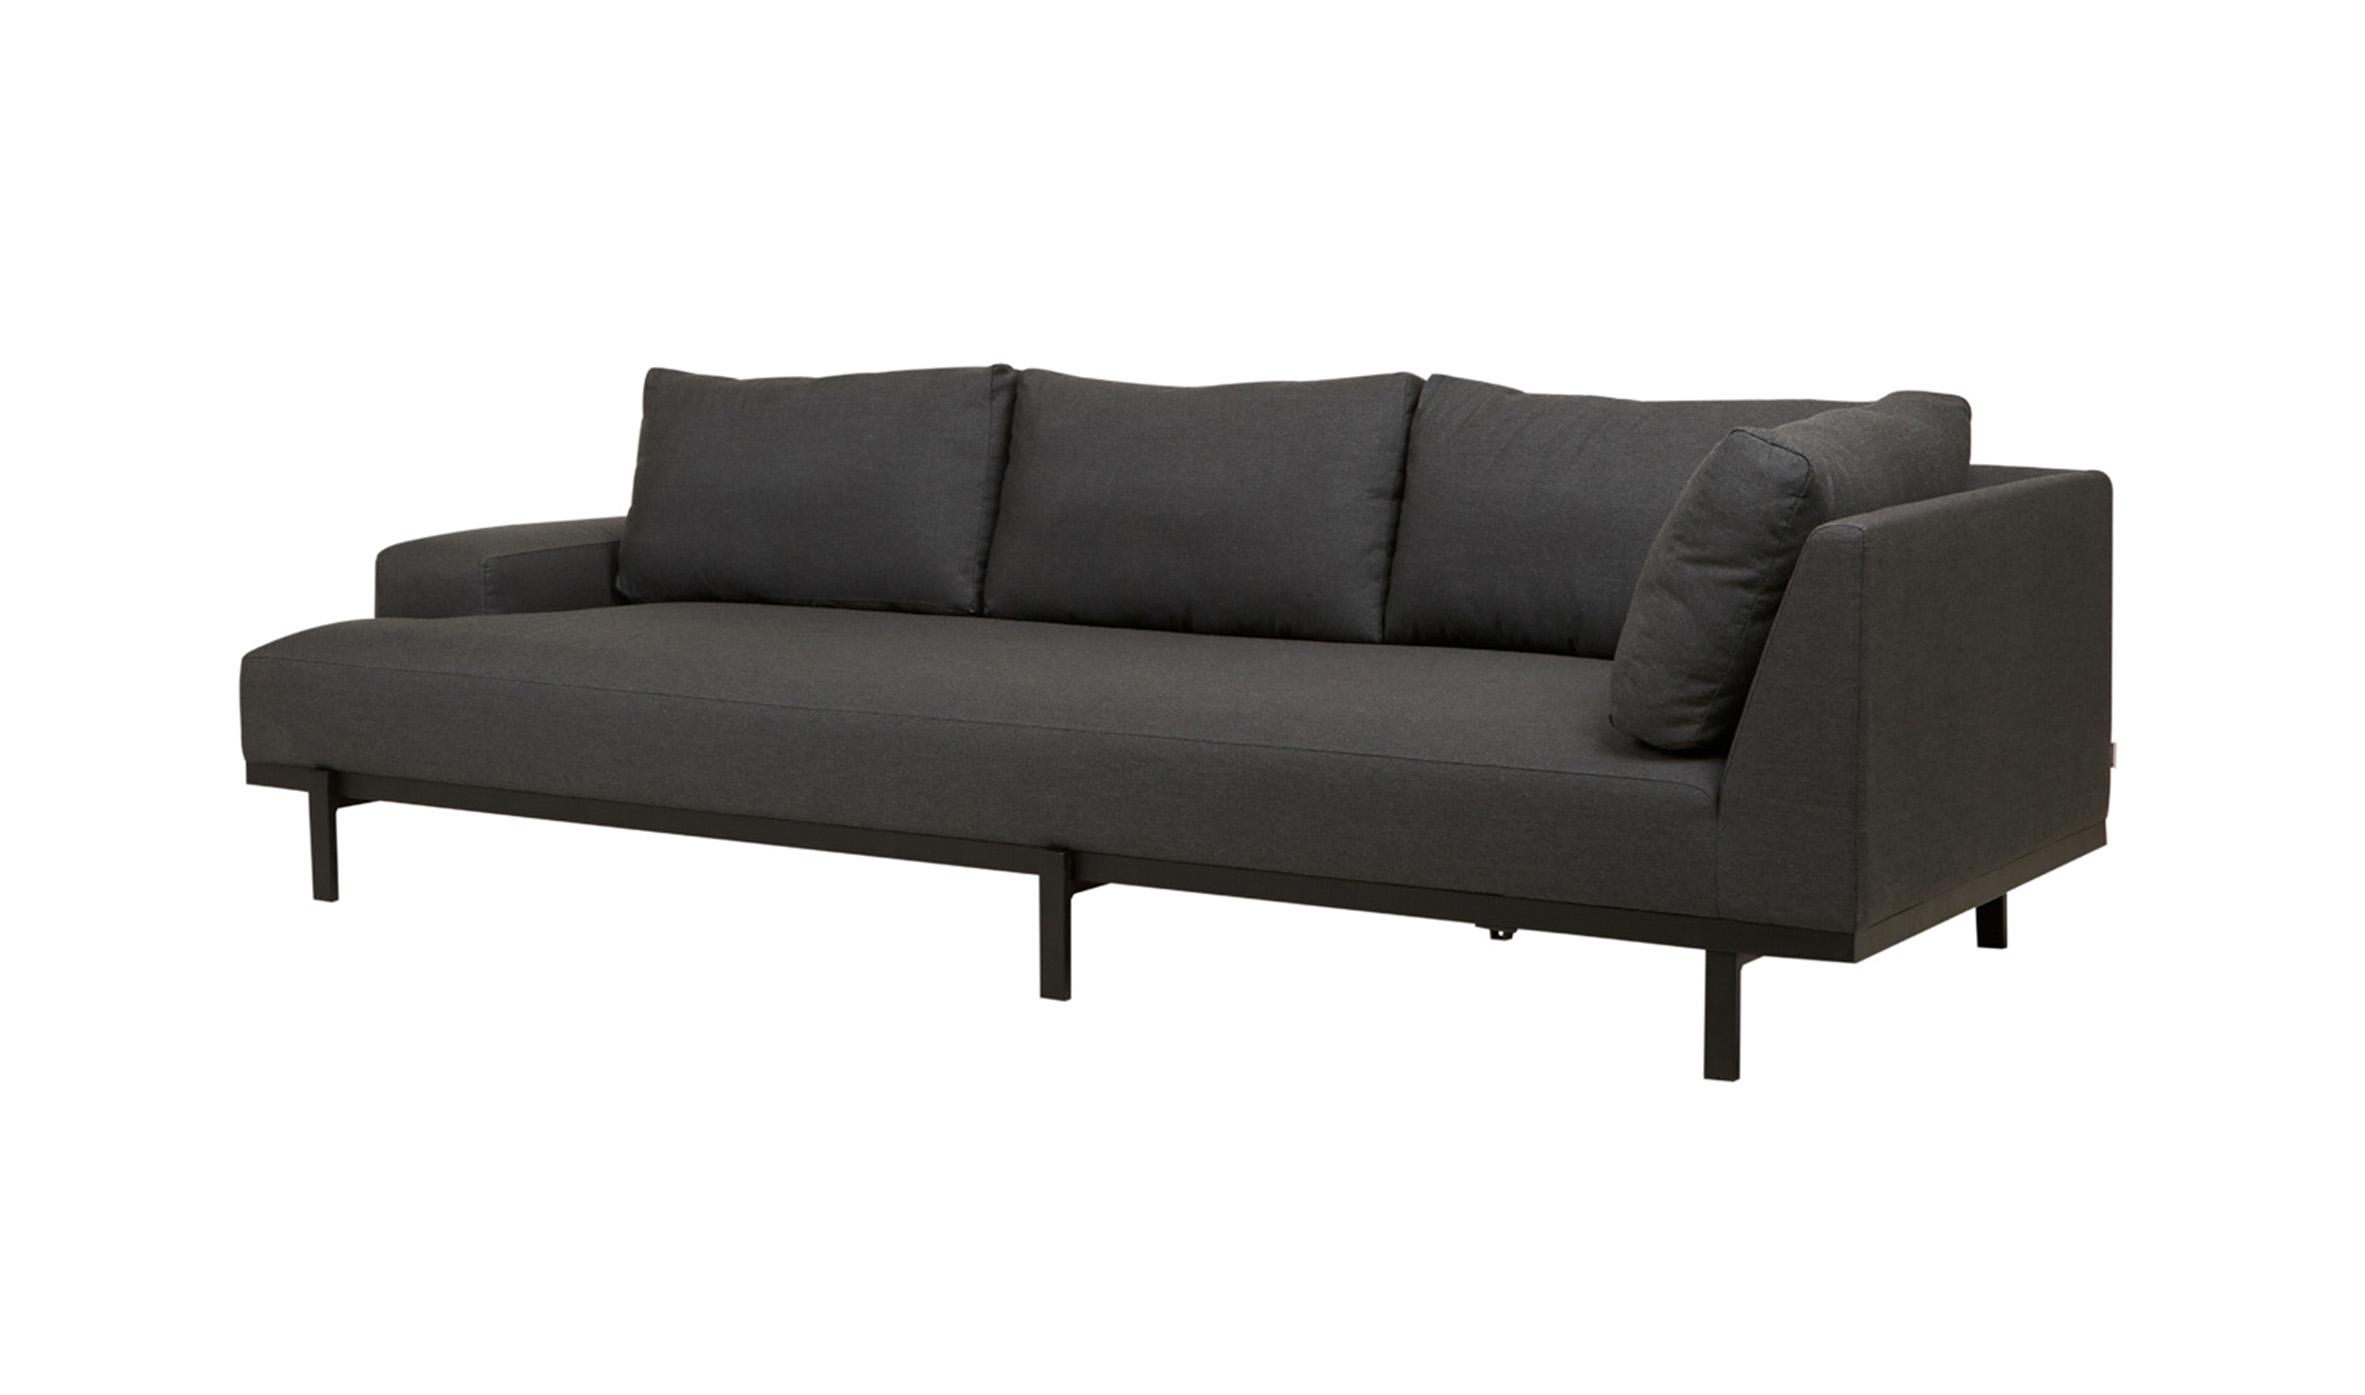 Furniture Thumbnails outdoor-sofas-aruba-platform-3-seater-left-chaise